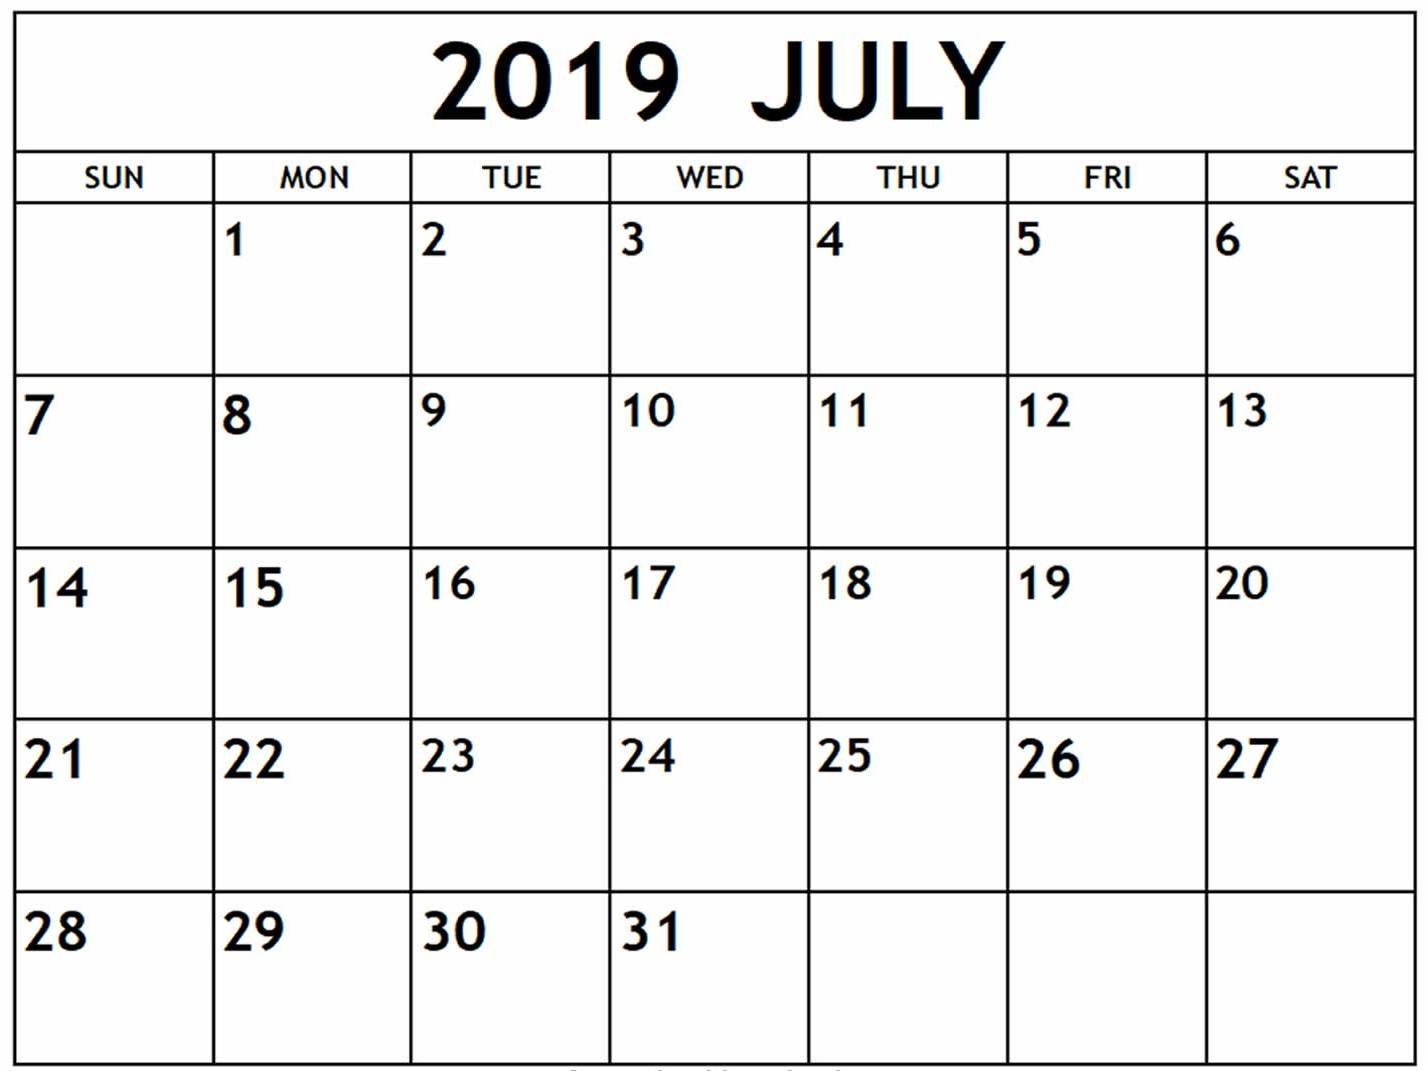 July 2019 Calendar Nz | Free Printable Calendar Shop